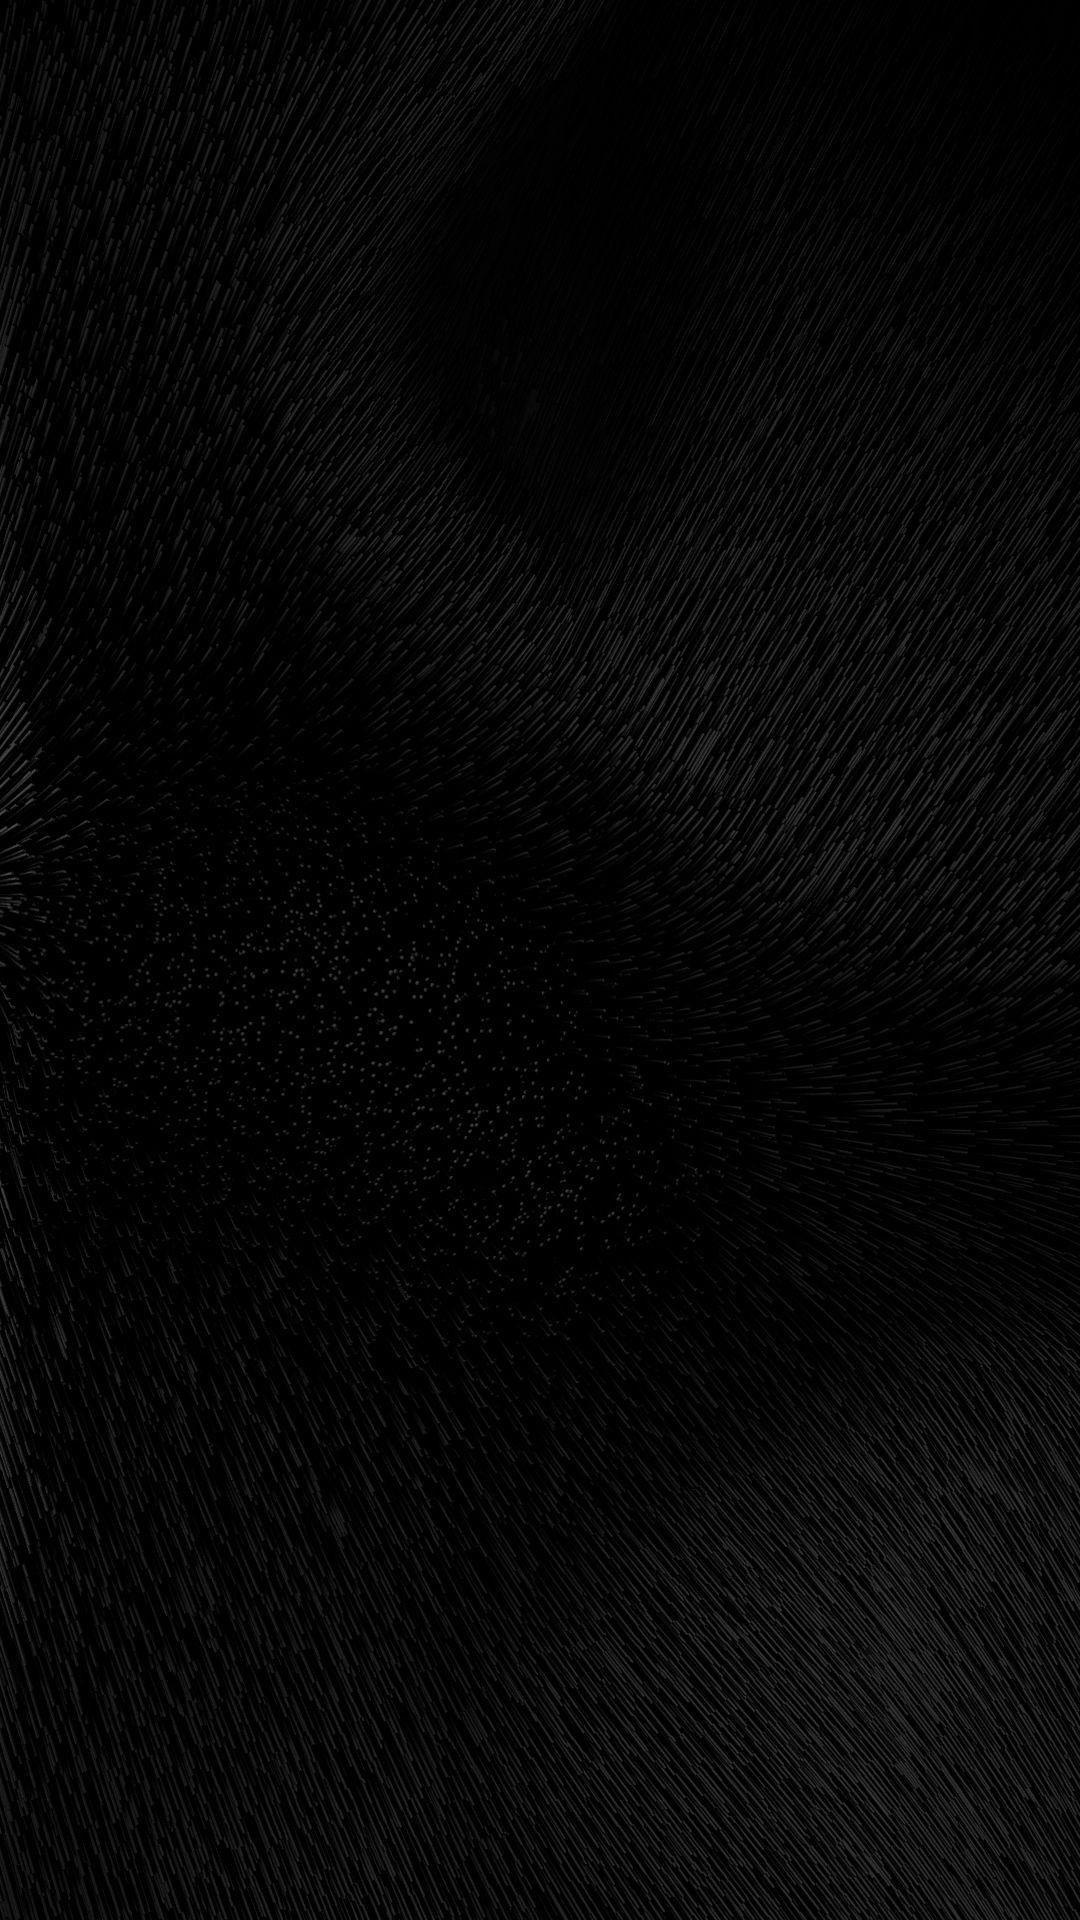 Iphone 7 Wallpaper Black Tecnologist Solid Black Wallpaper Pure Black Wallpaper Black Hd Wallpaper